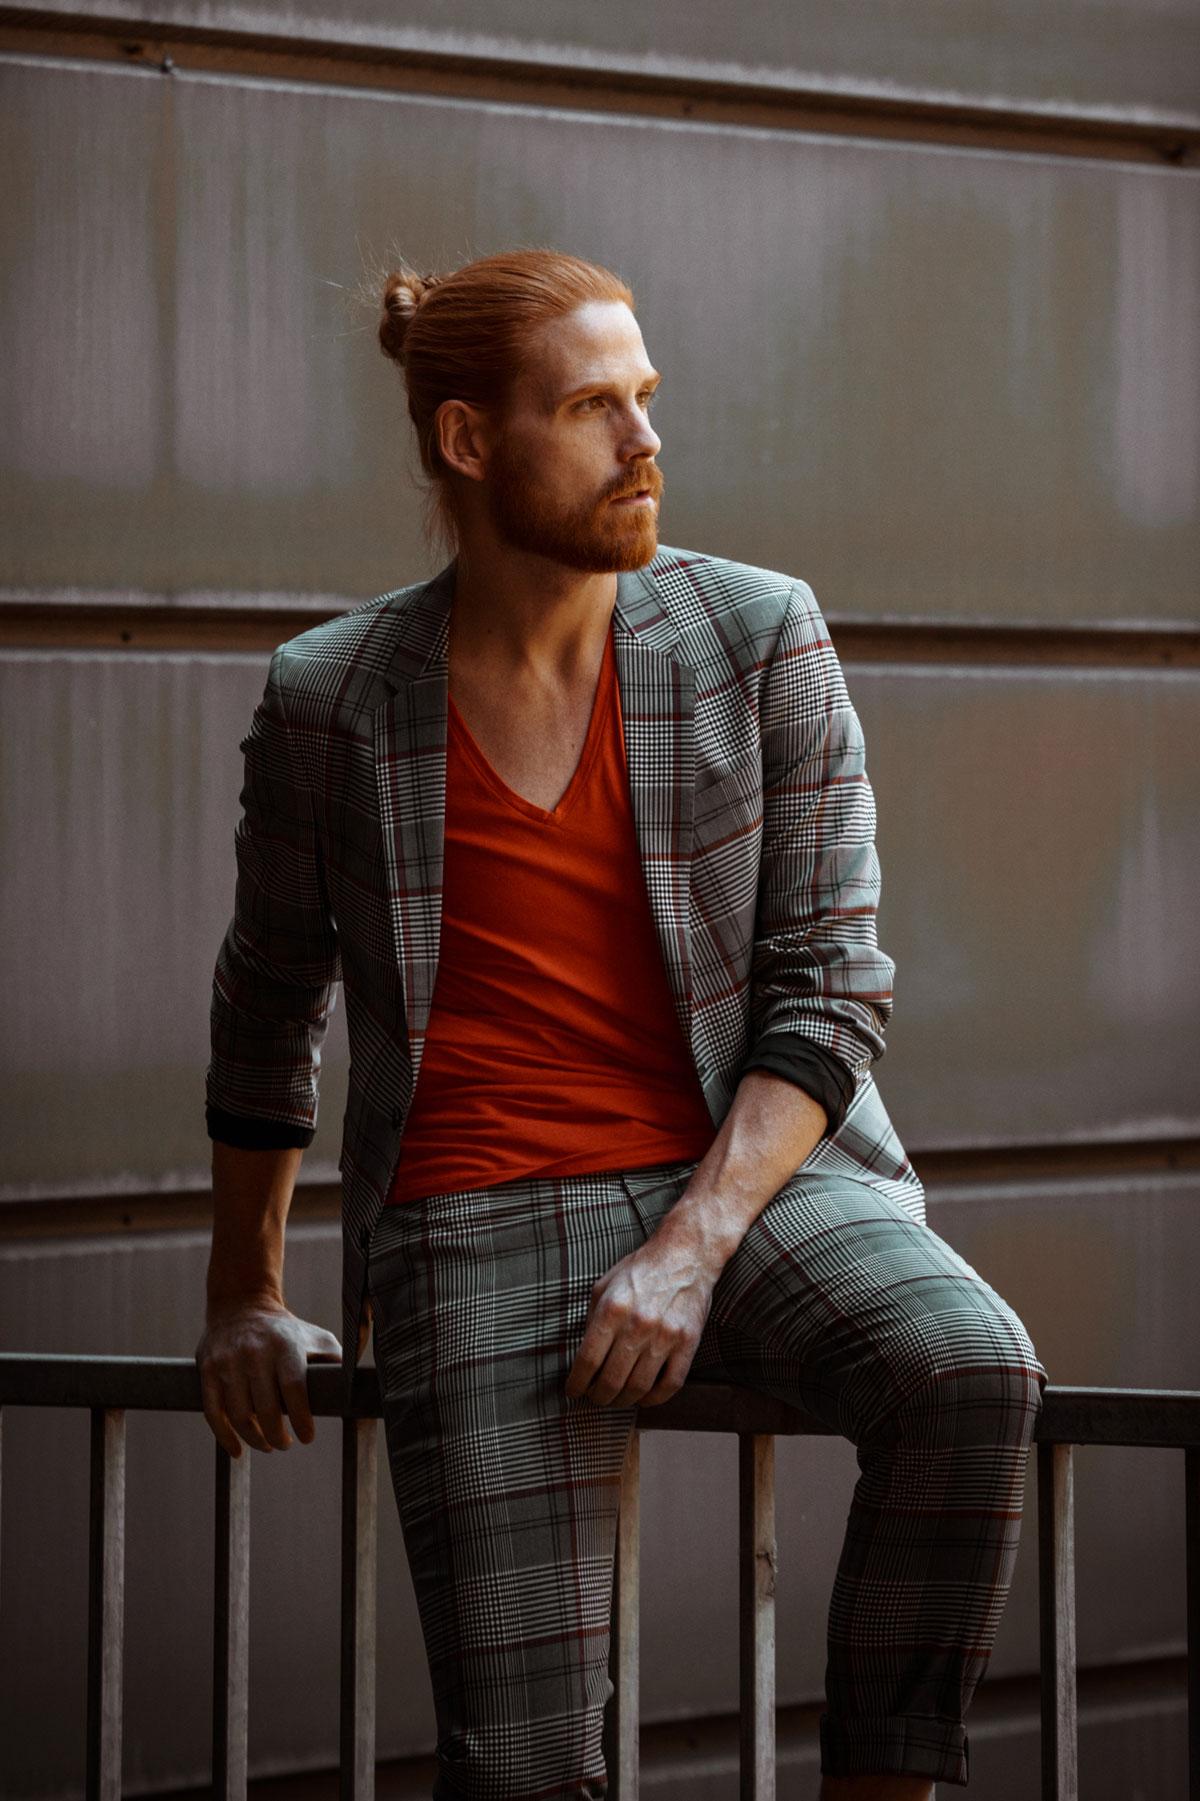 Malefashion-Anzug-Karos-Herbstlook-Drykorn-Style